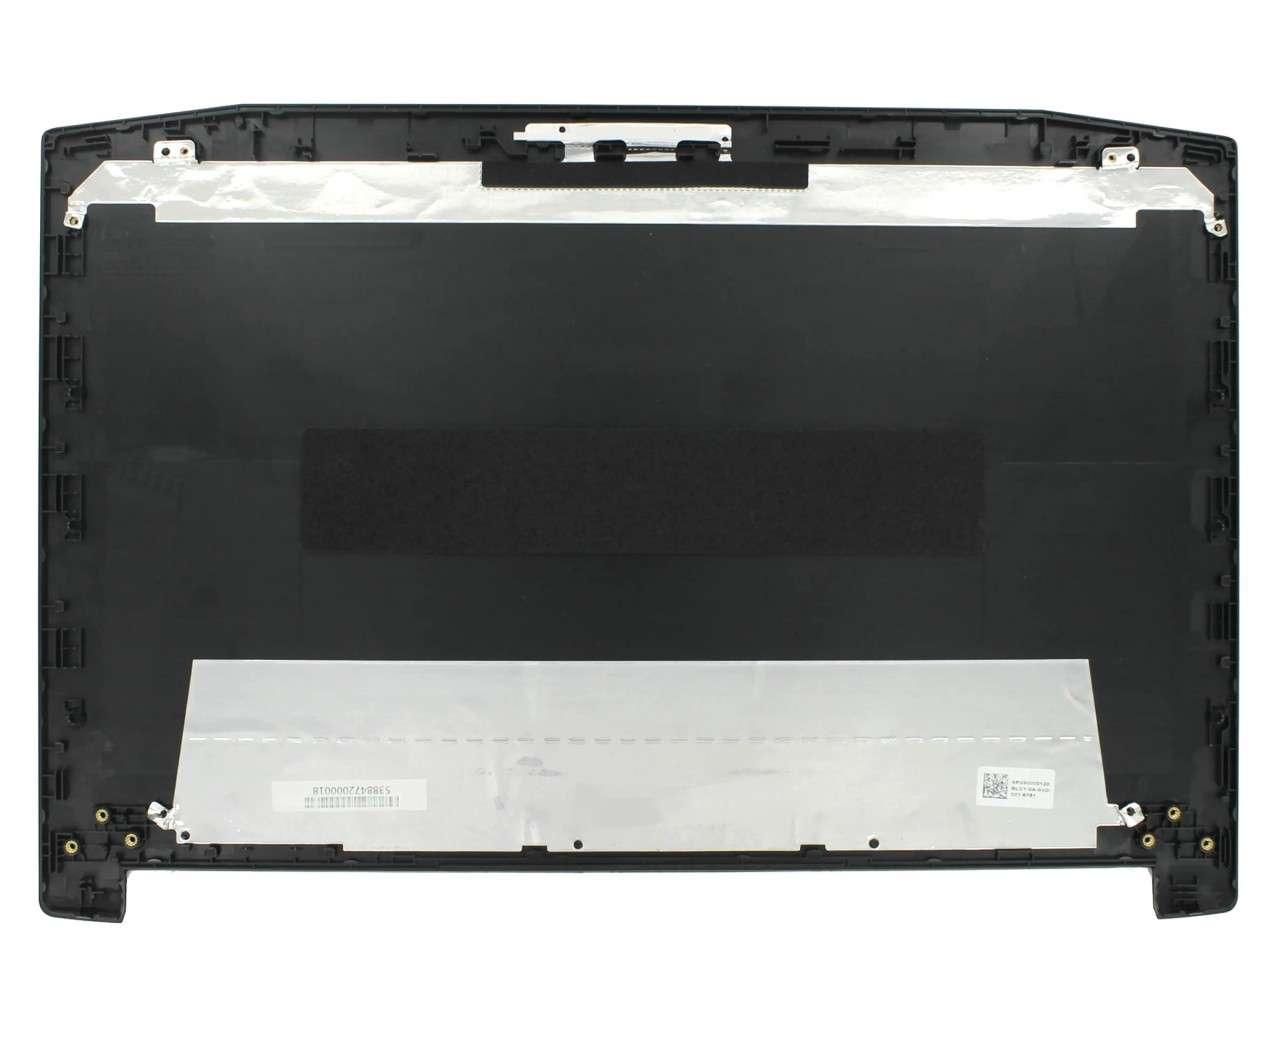 Capac Display BackCover Acer Nitro 5 AN515-41 Carcasa Display imagine powerlaptop.ro 2021